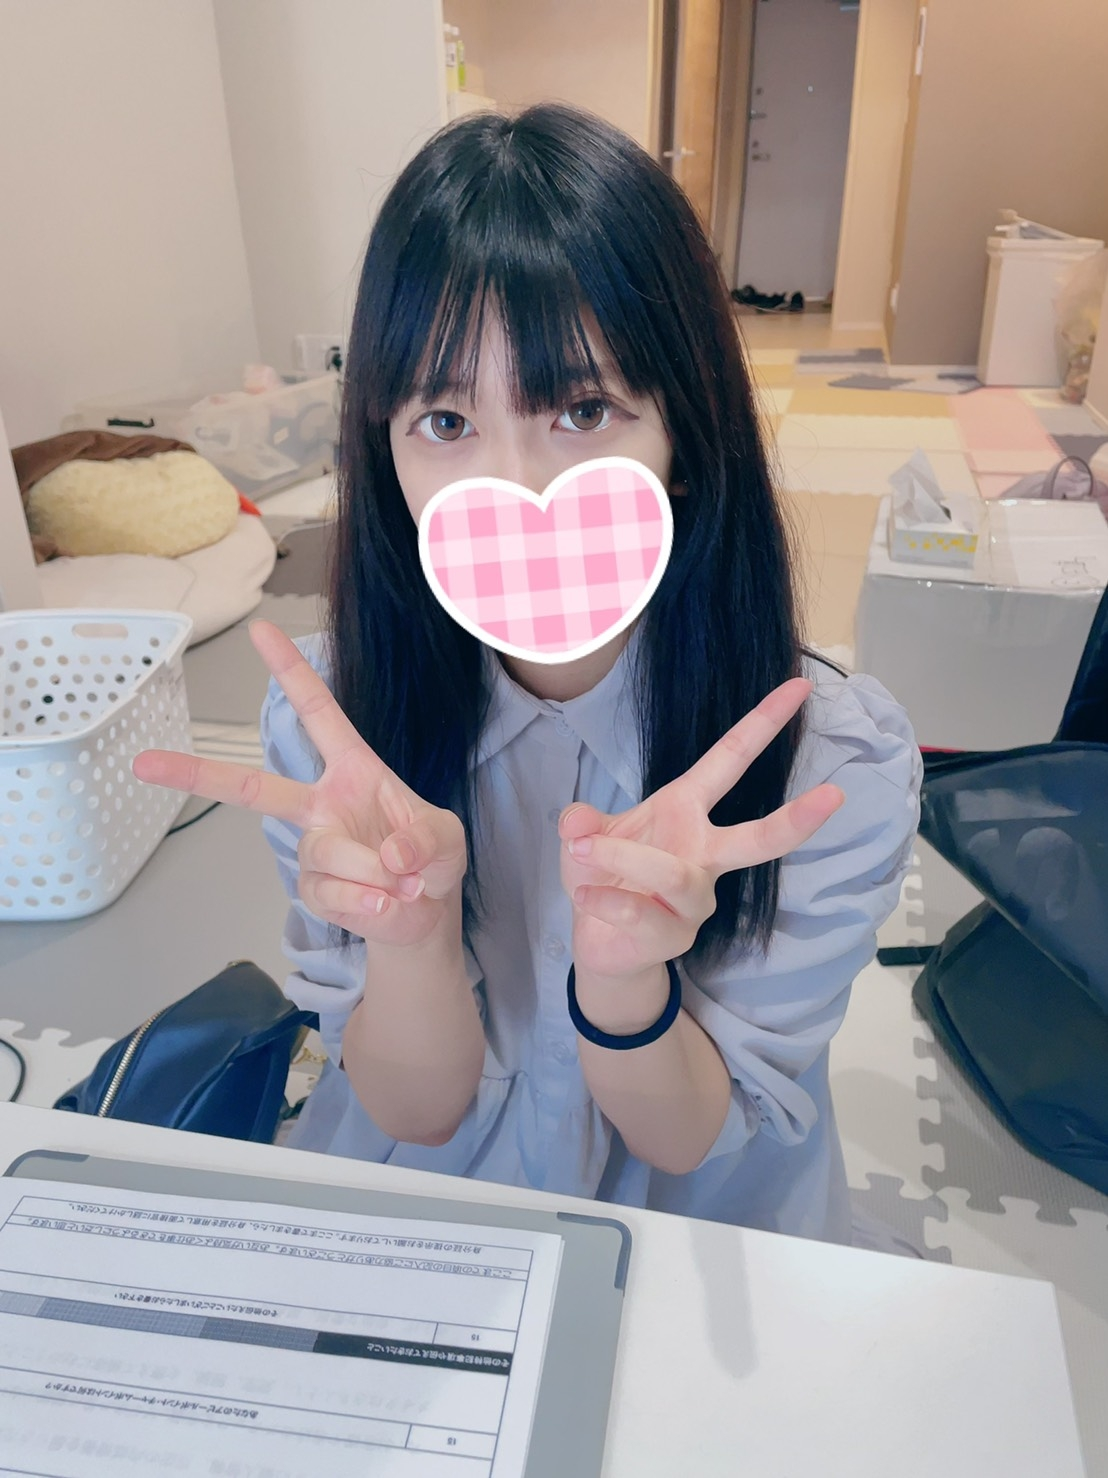 【JKリフレ東京】美樹さやかJK上がりたて18歳 8月10日体験入店A